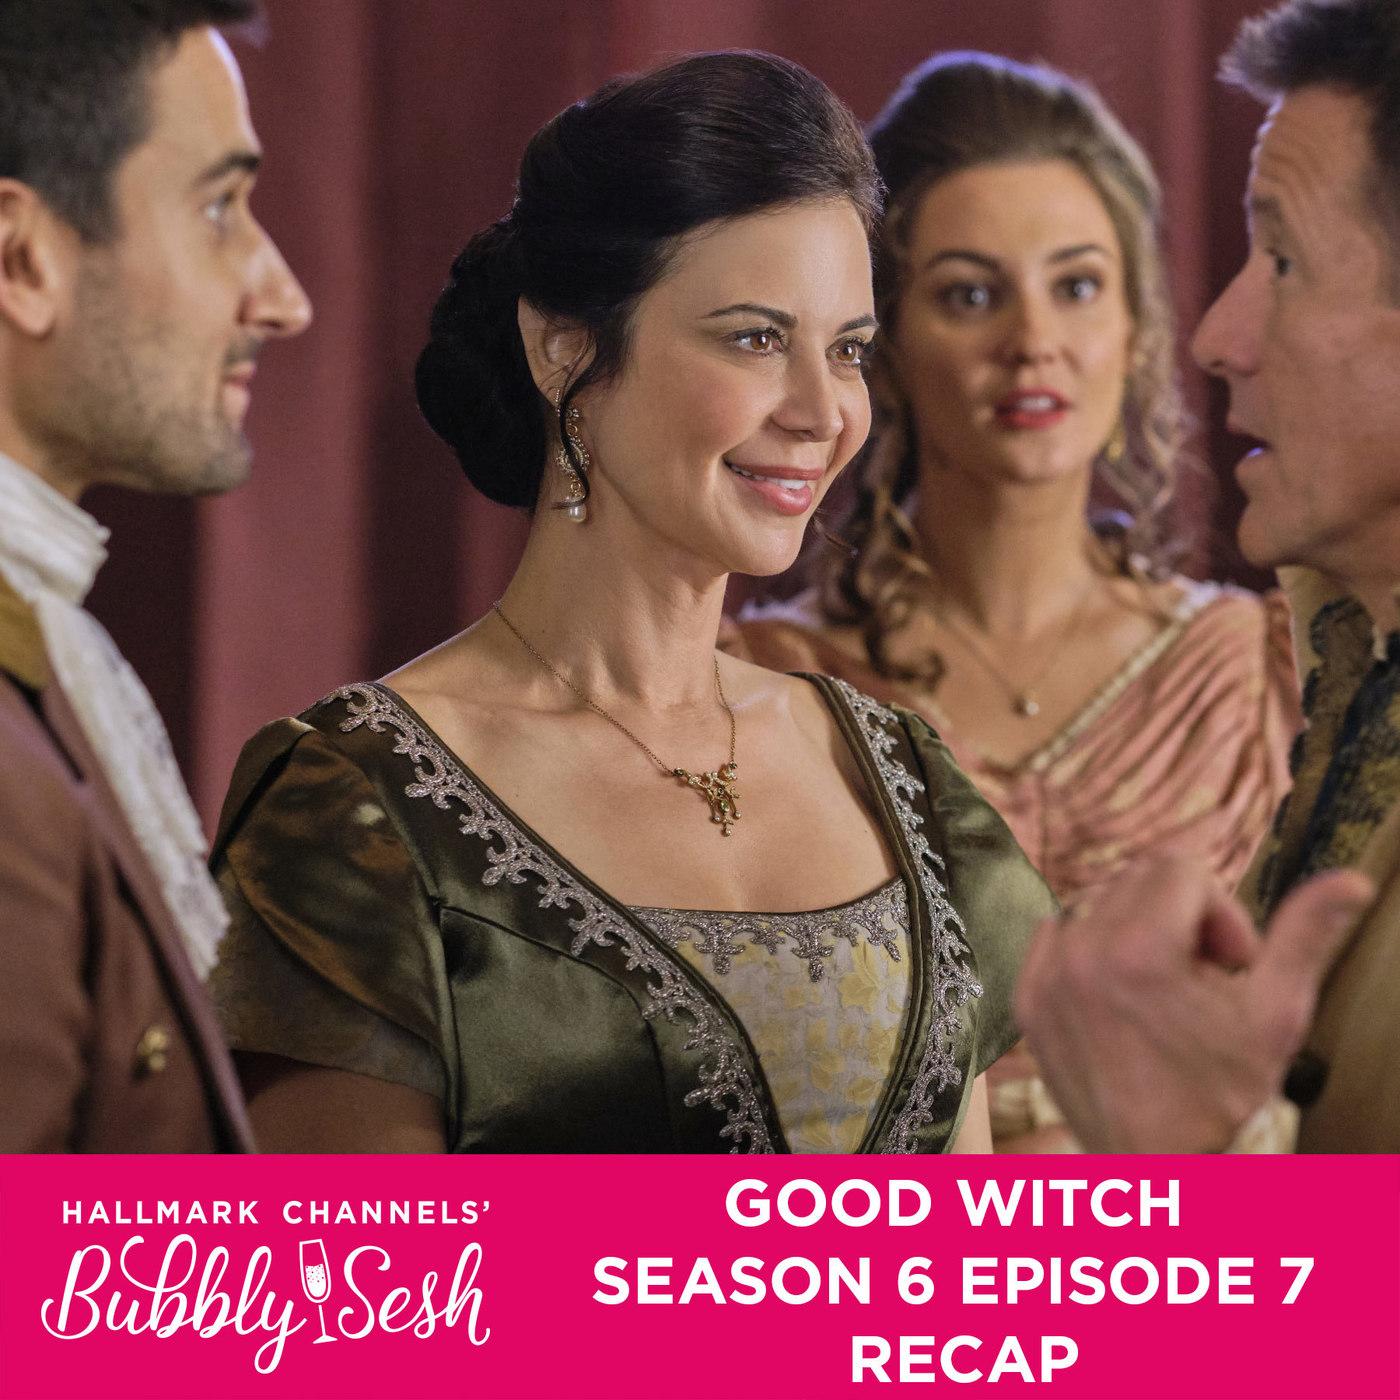 Good Witch Season 6, Episode 7 Recap